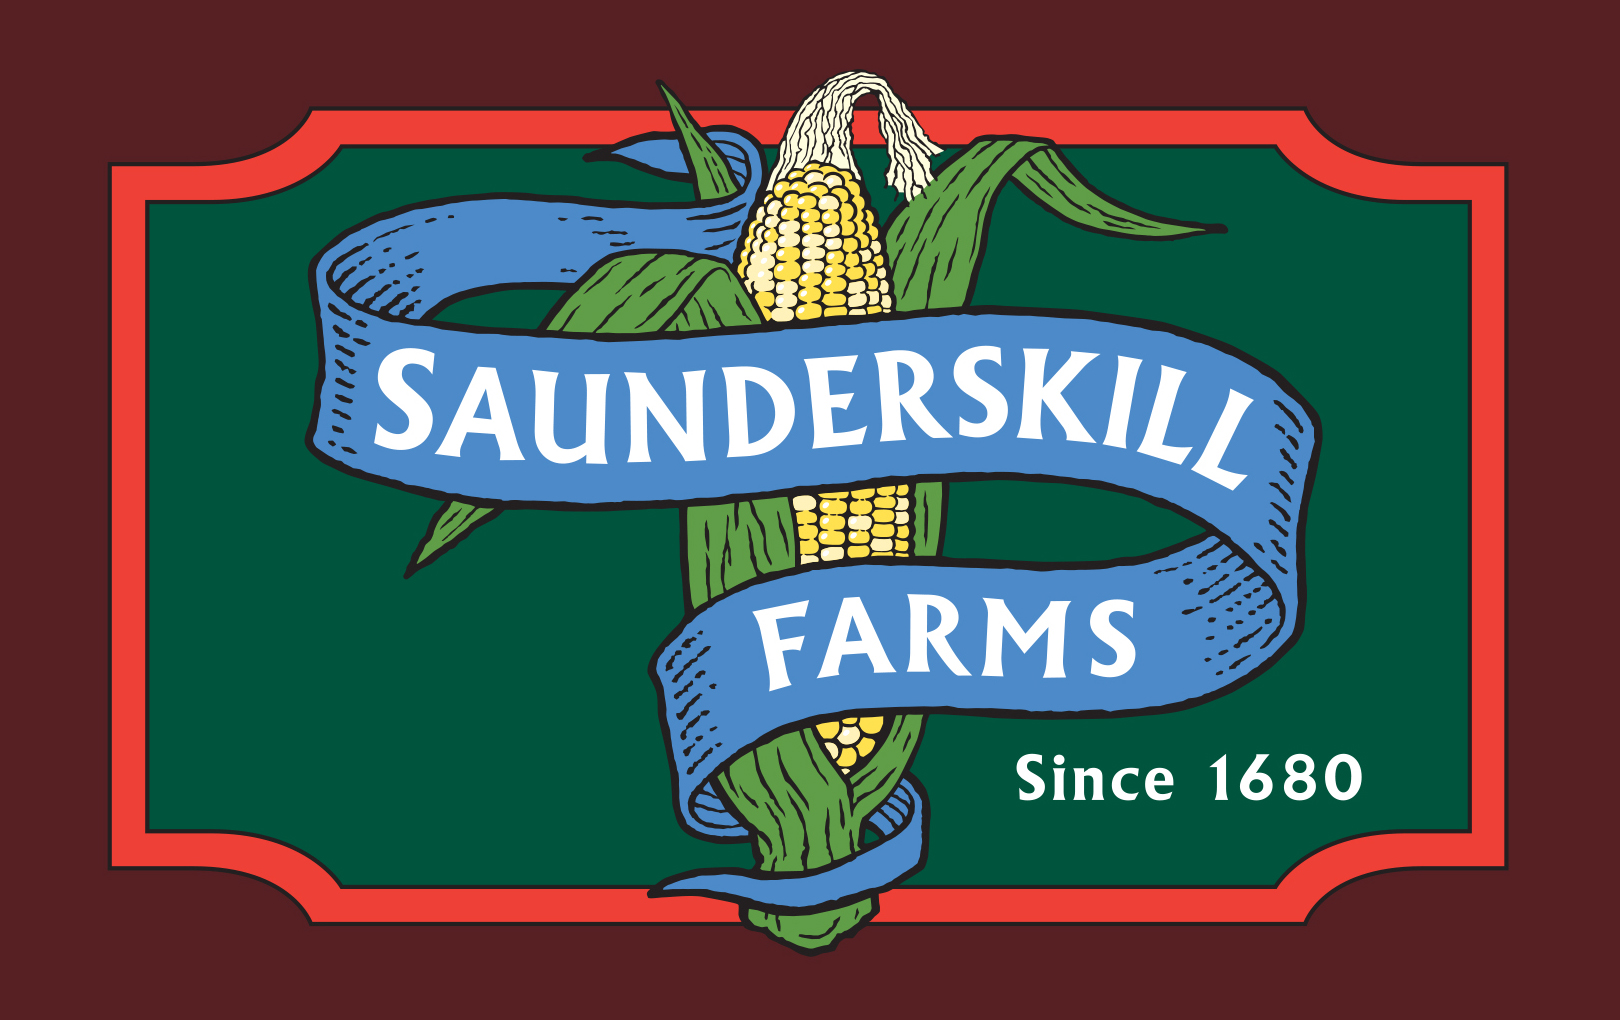 2-Saunderskill-logo-sign.jpg